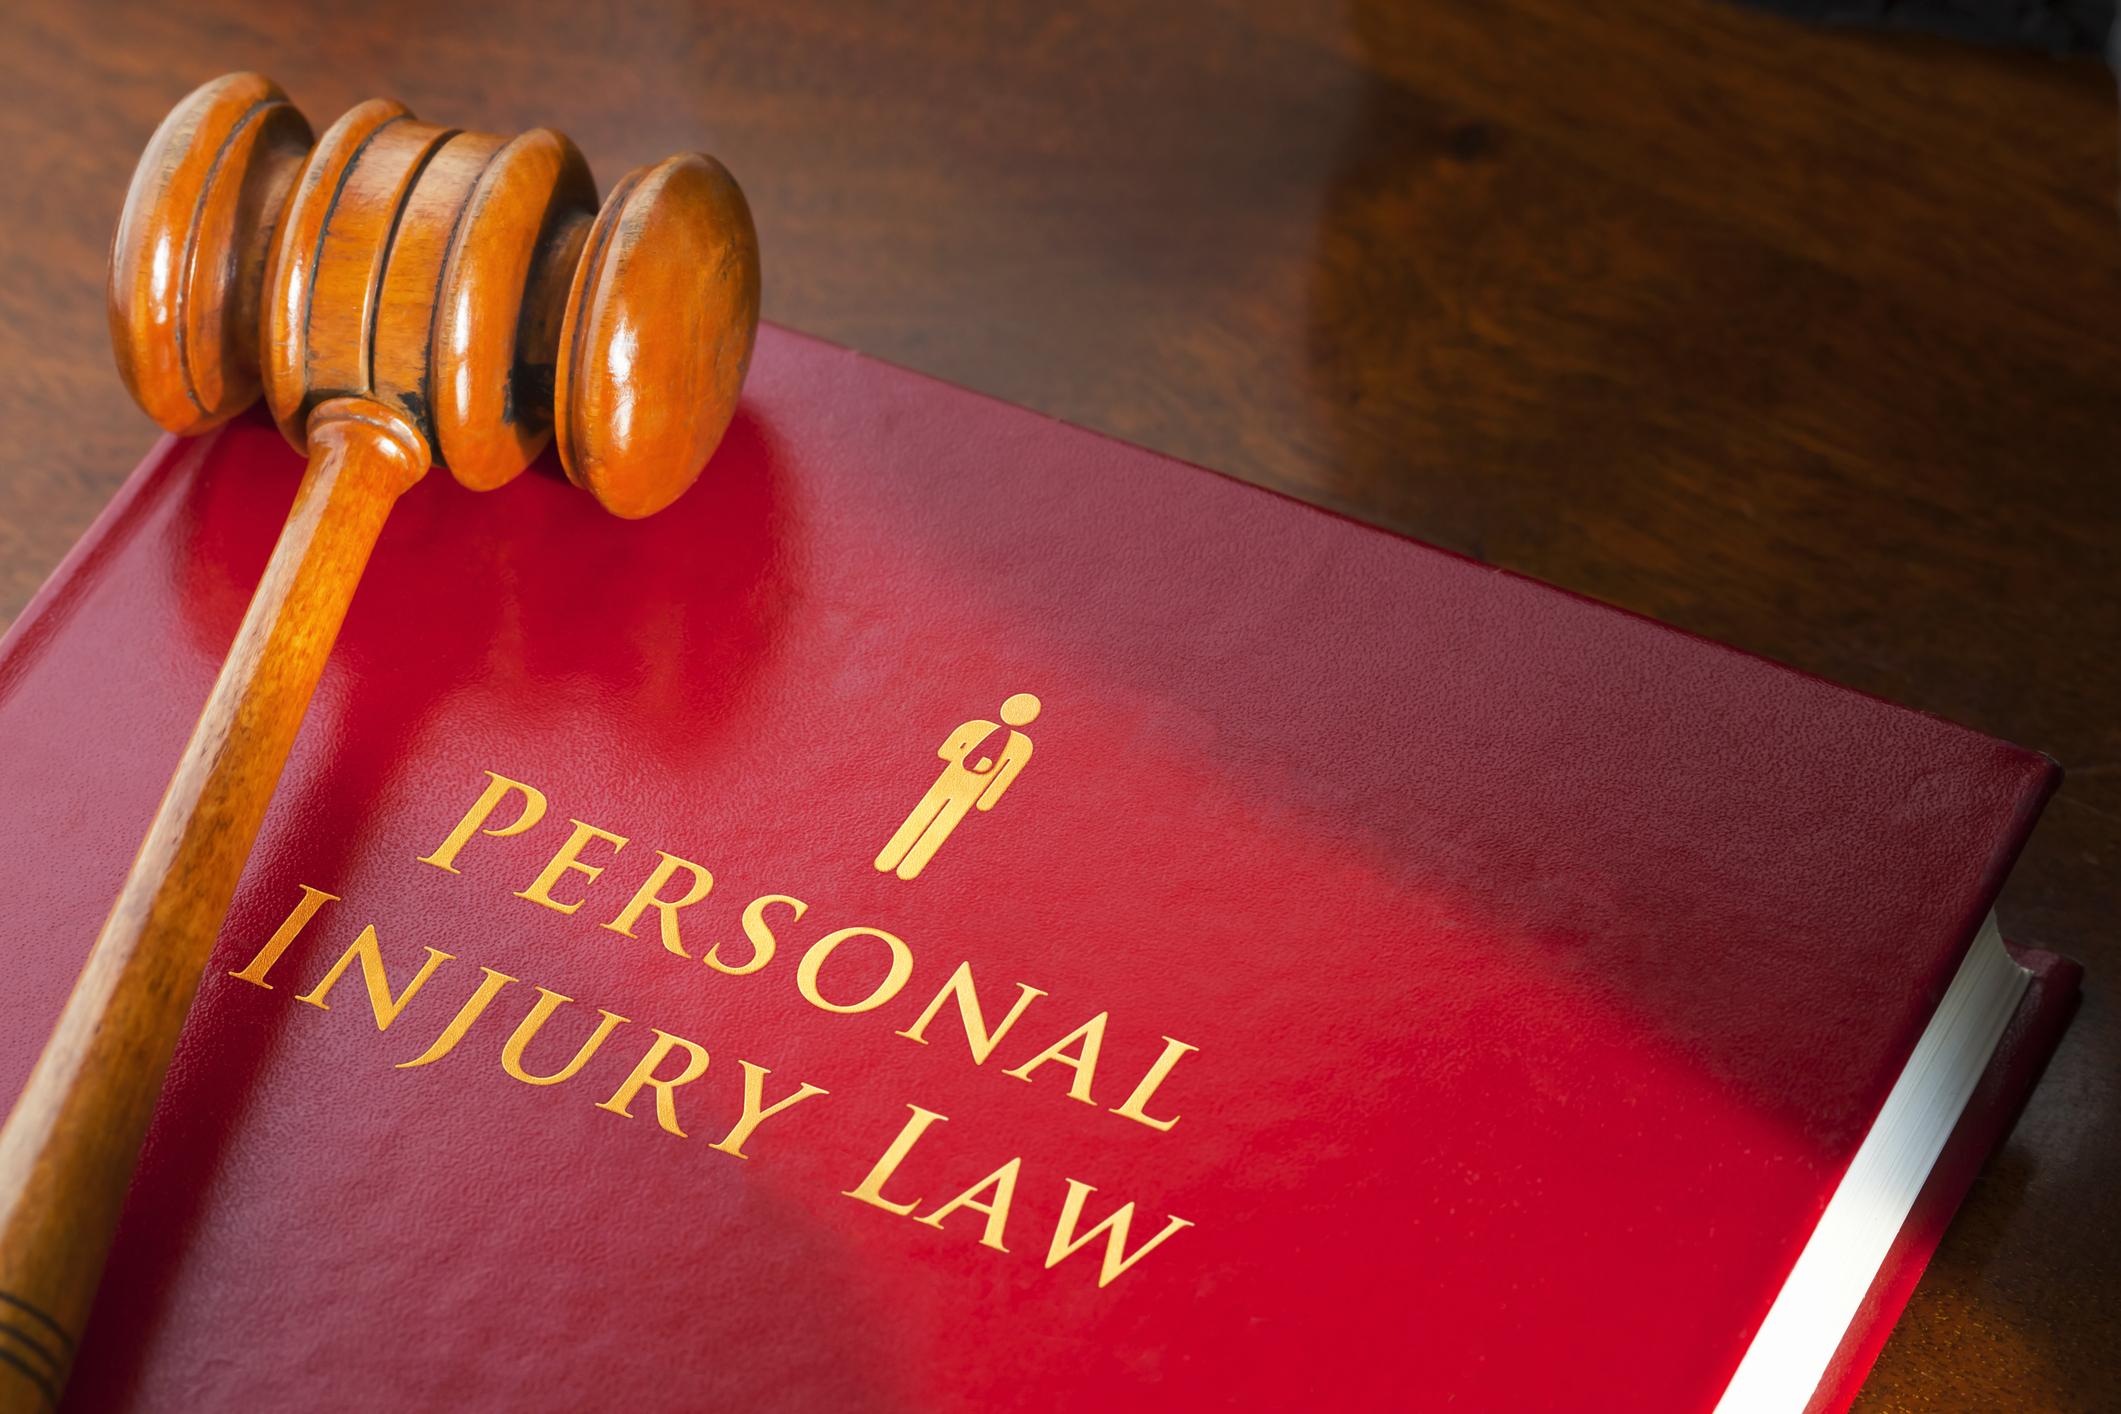 black-personal-injury-attorneys-charlotte-mecklenburg-county-north-carolina.jpg